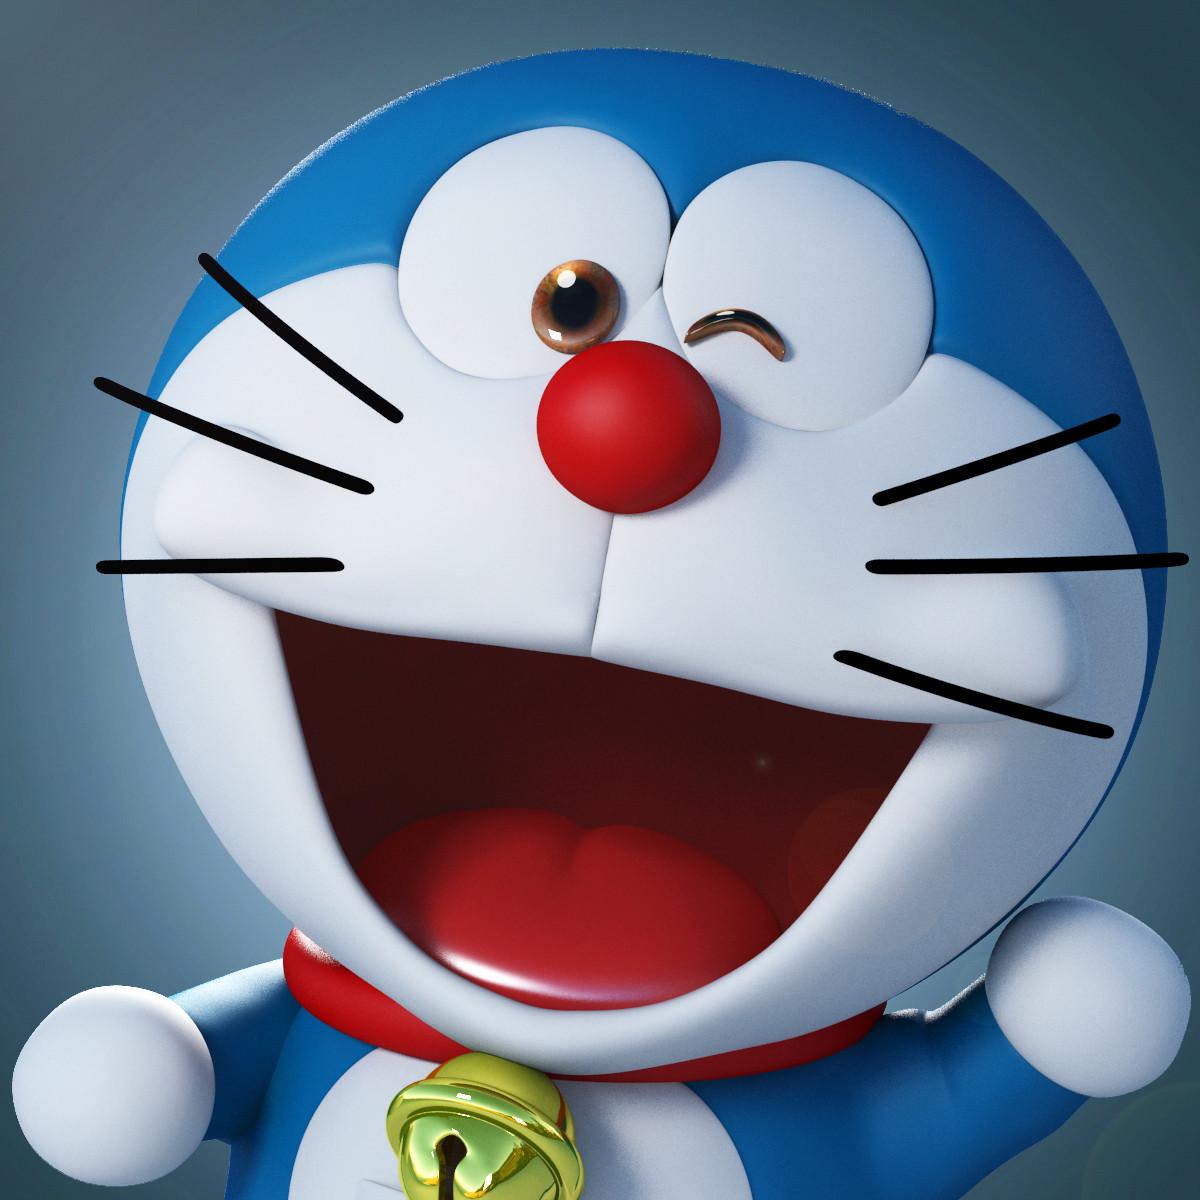 Gambar Wallpaper Doraemon 3d Kampung Wallpaper